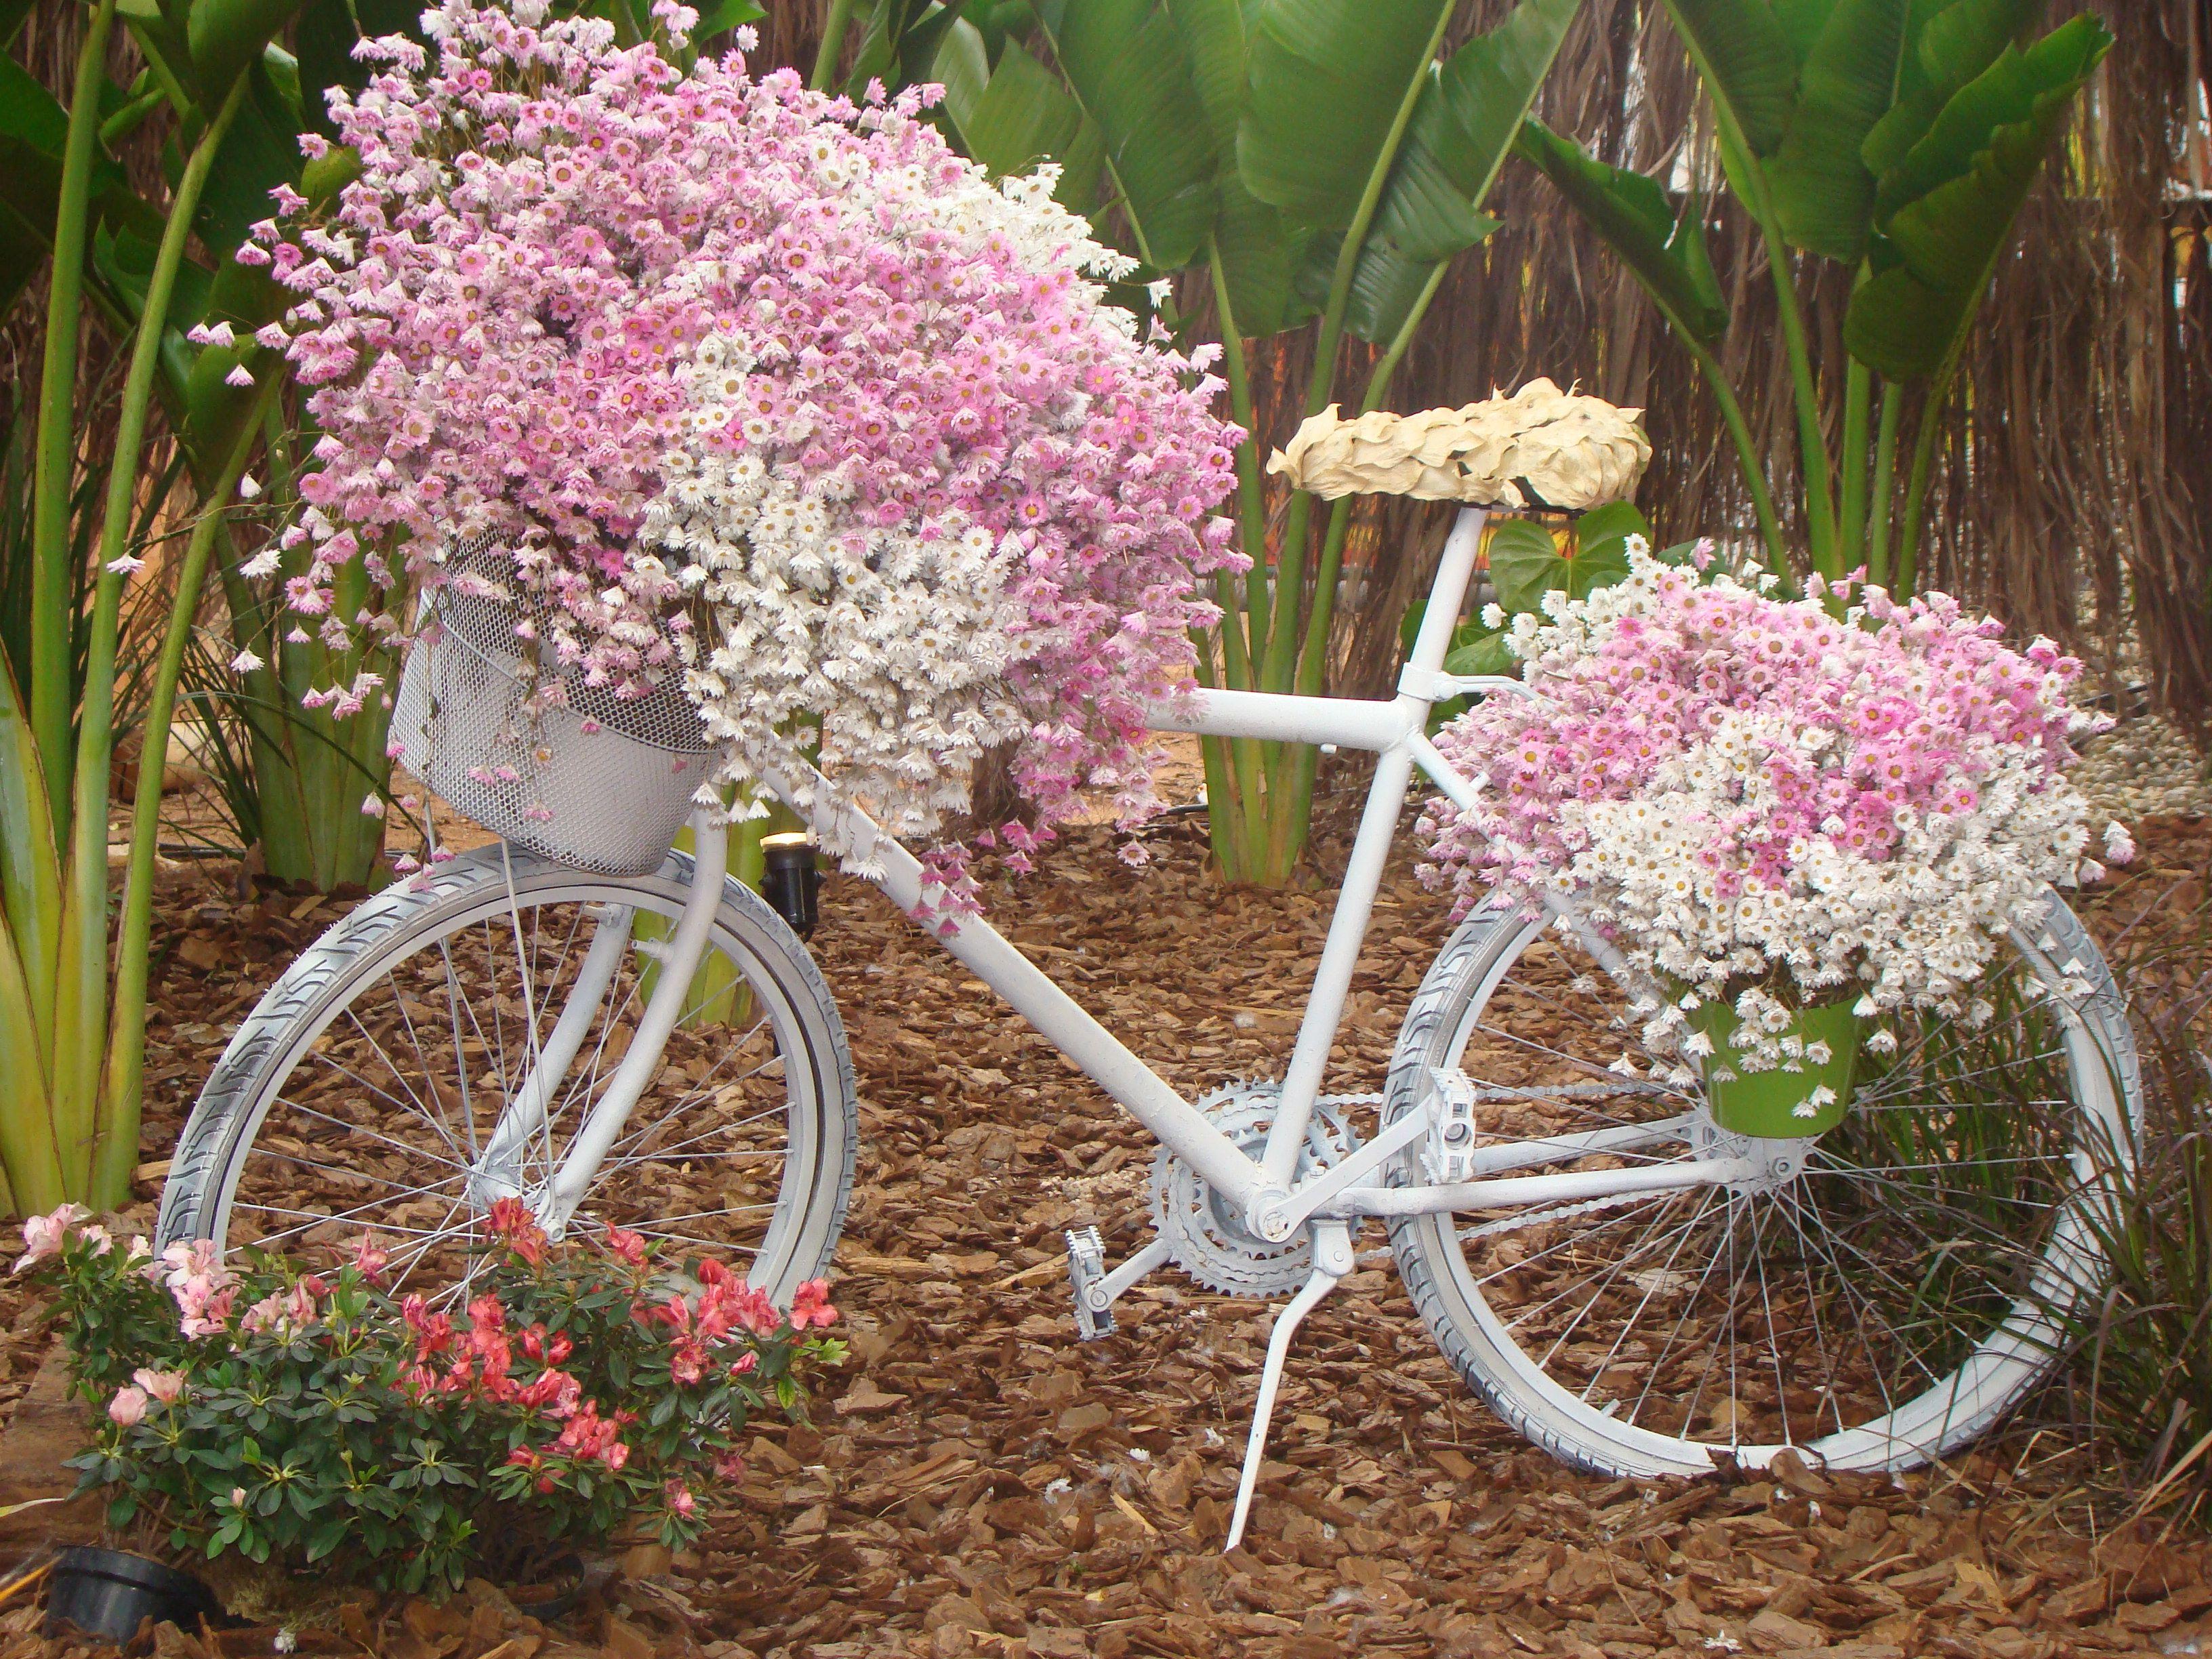 Brouette Deco Jardin Beau Collection Eileen Clark Pink Pinterest